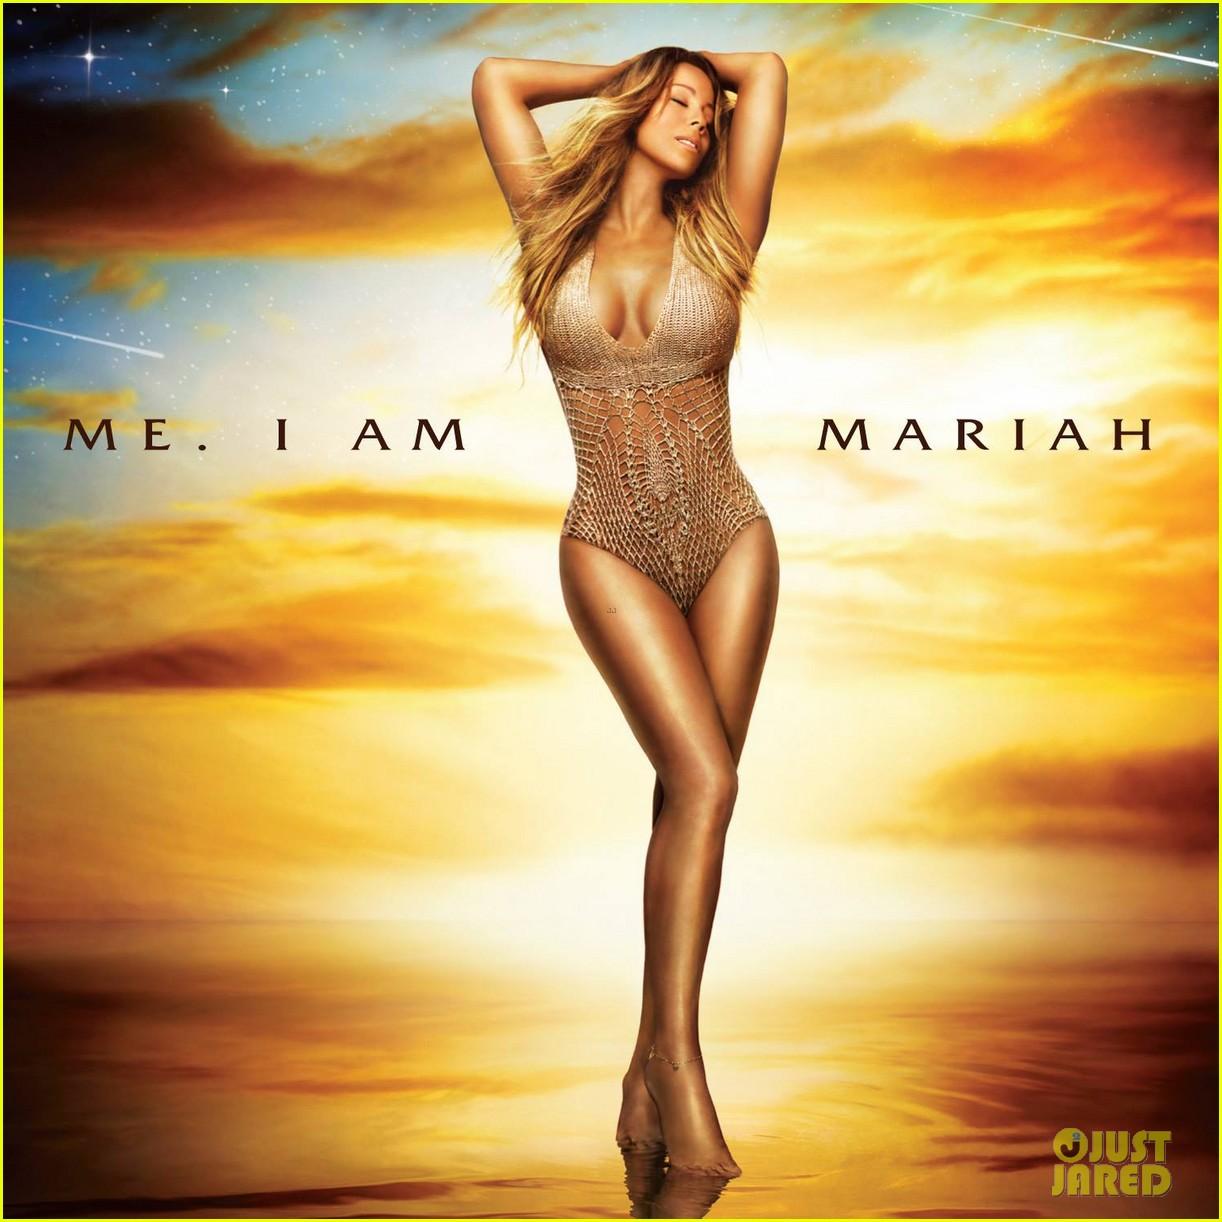 mariah carey announces new album me i am mariah 03